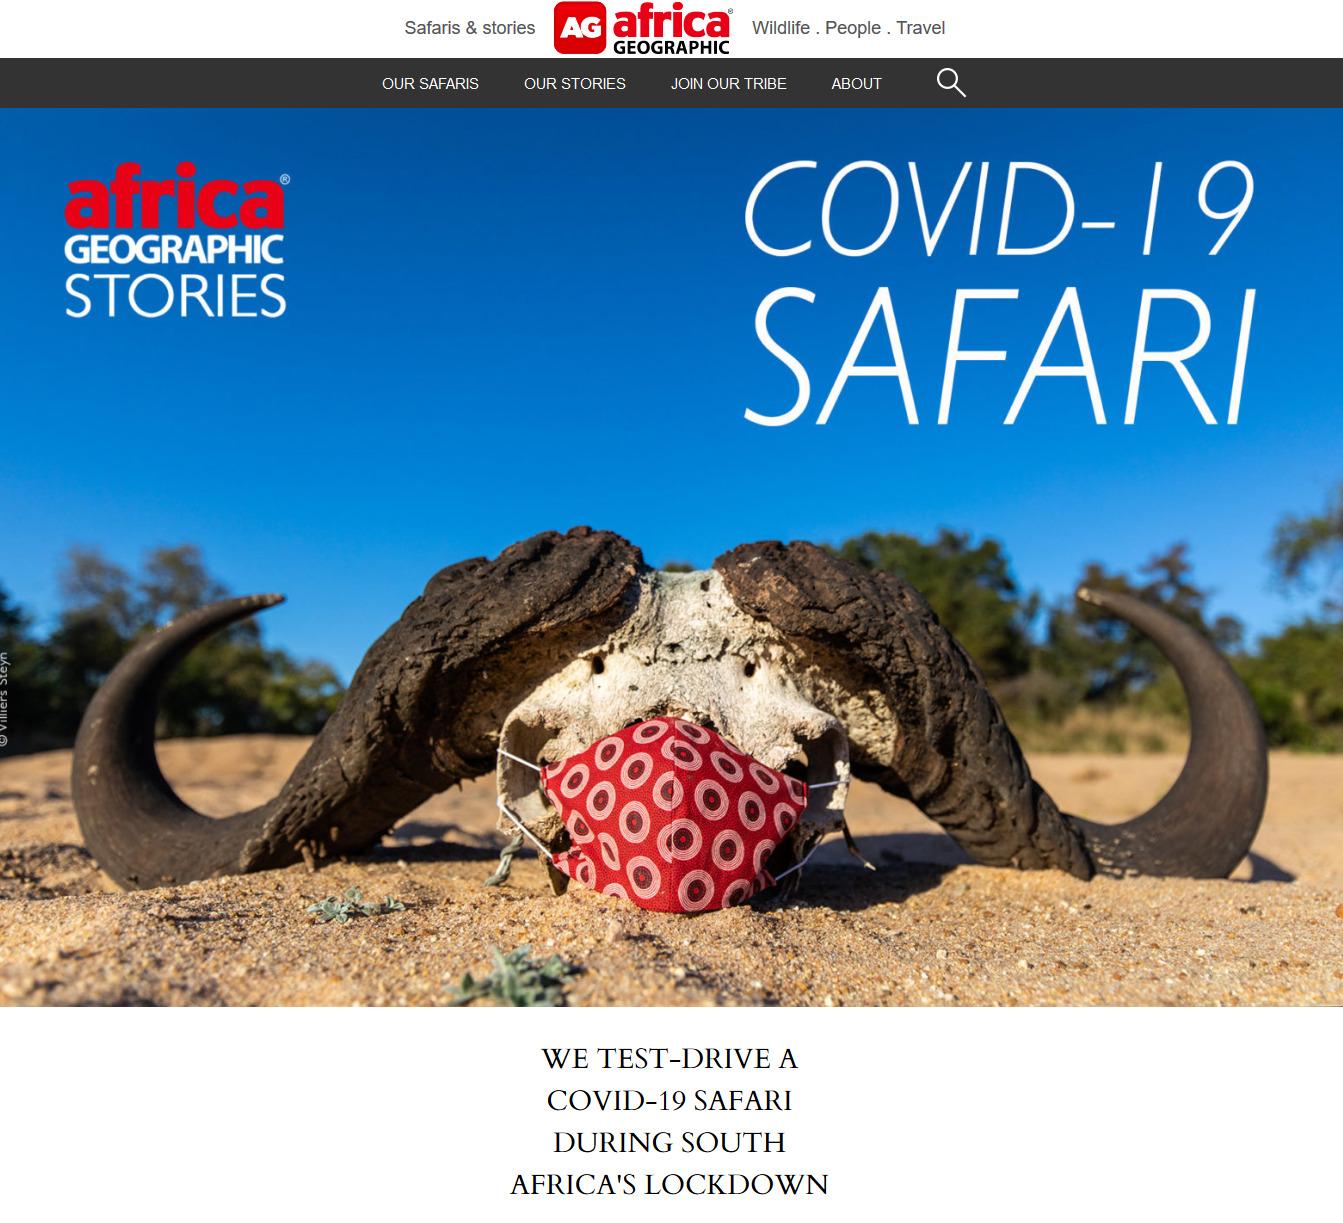 Screenshot_2020-06-22 COVID-19 safari during lockdown we test-drive - Africa Geographic.jpg